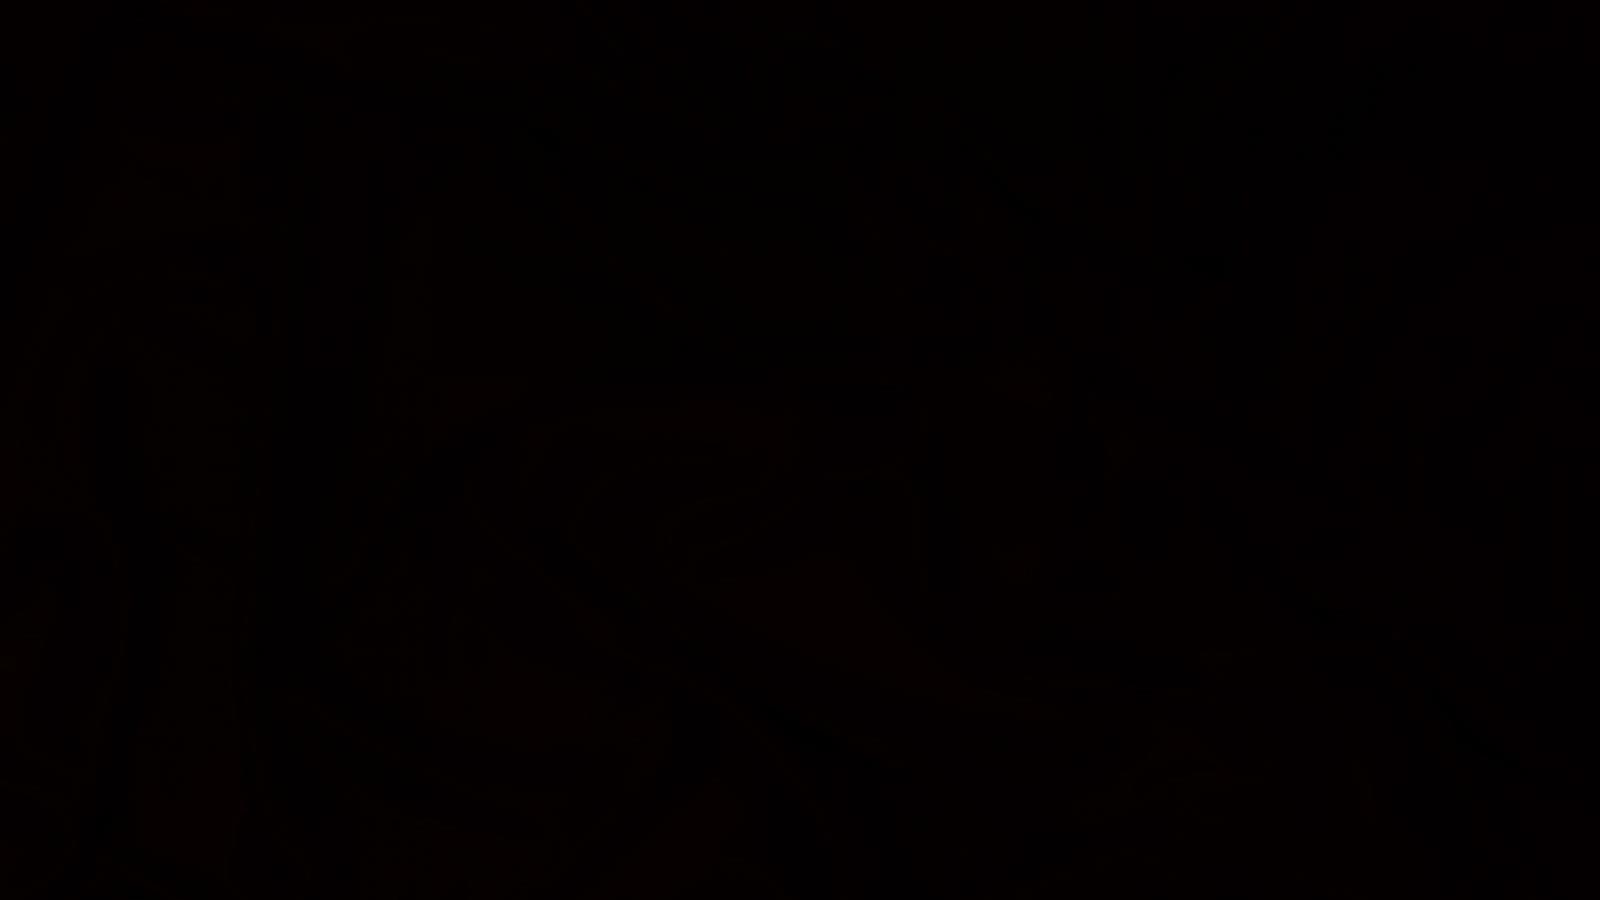 black background   Large Images 1600x900